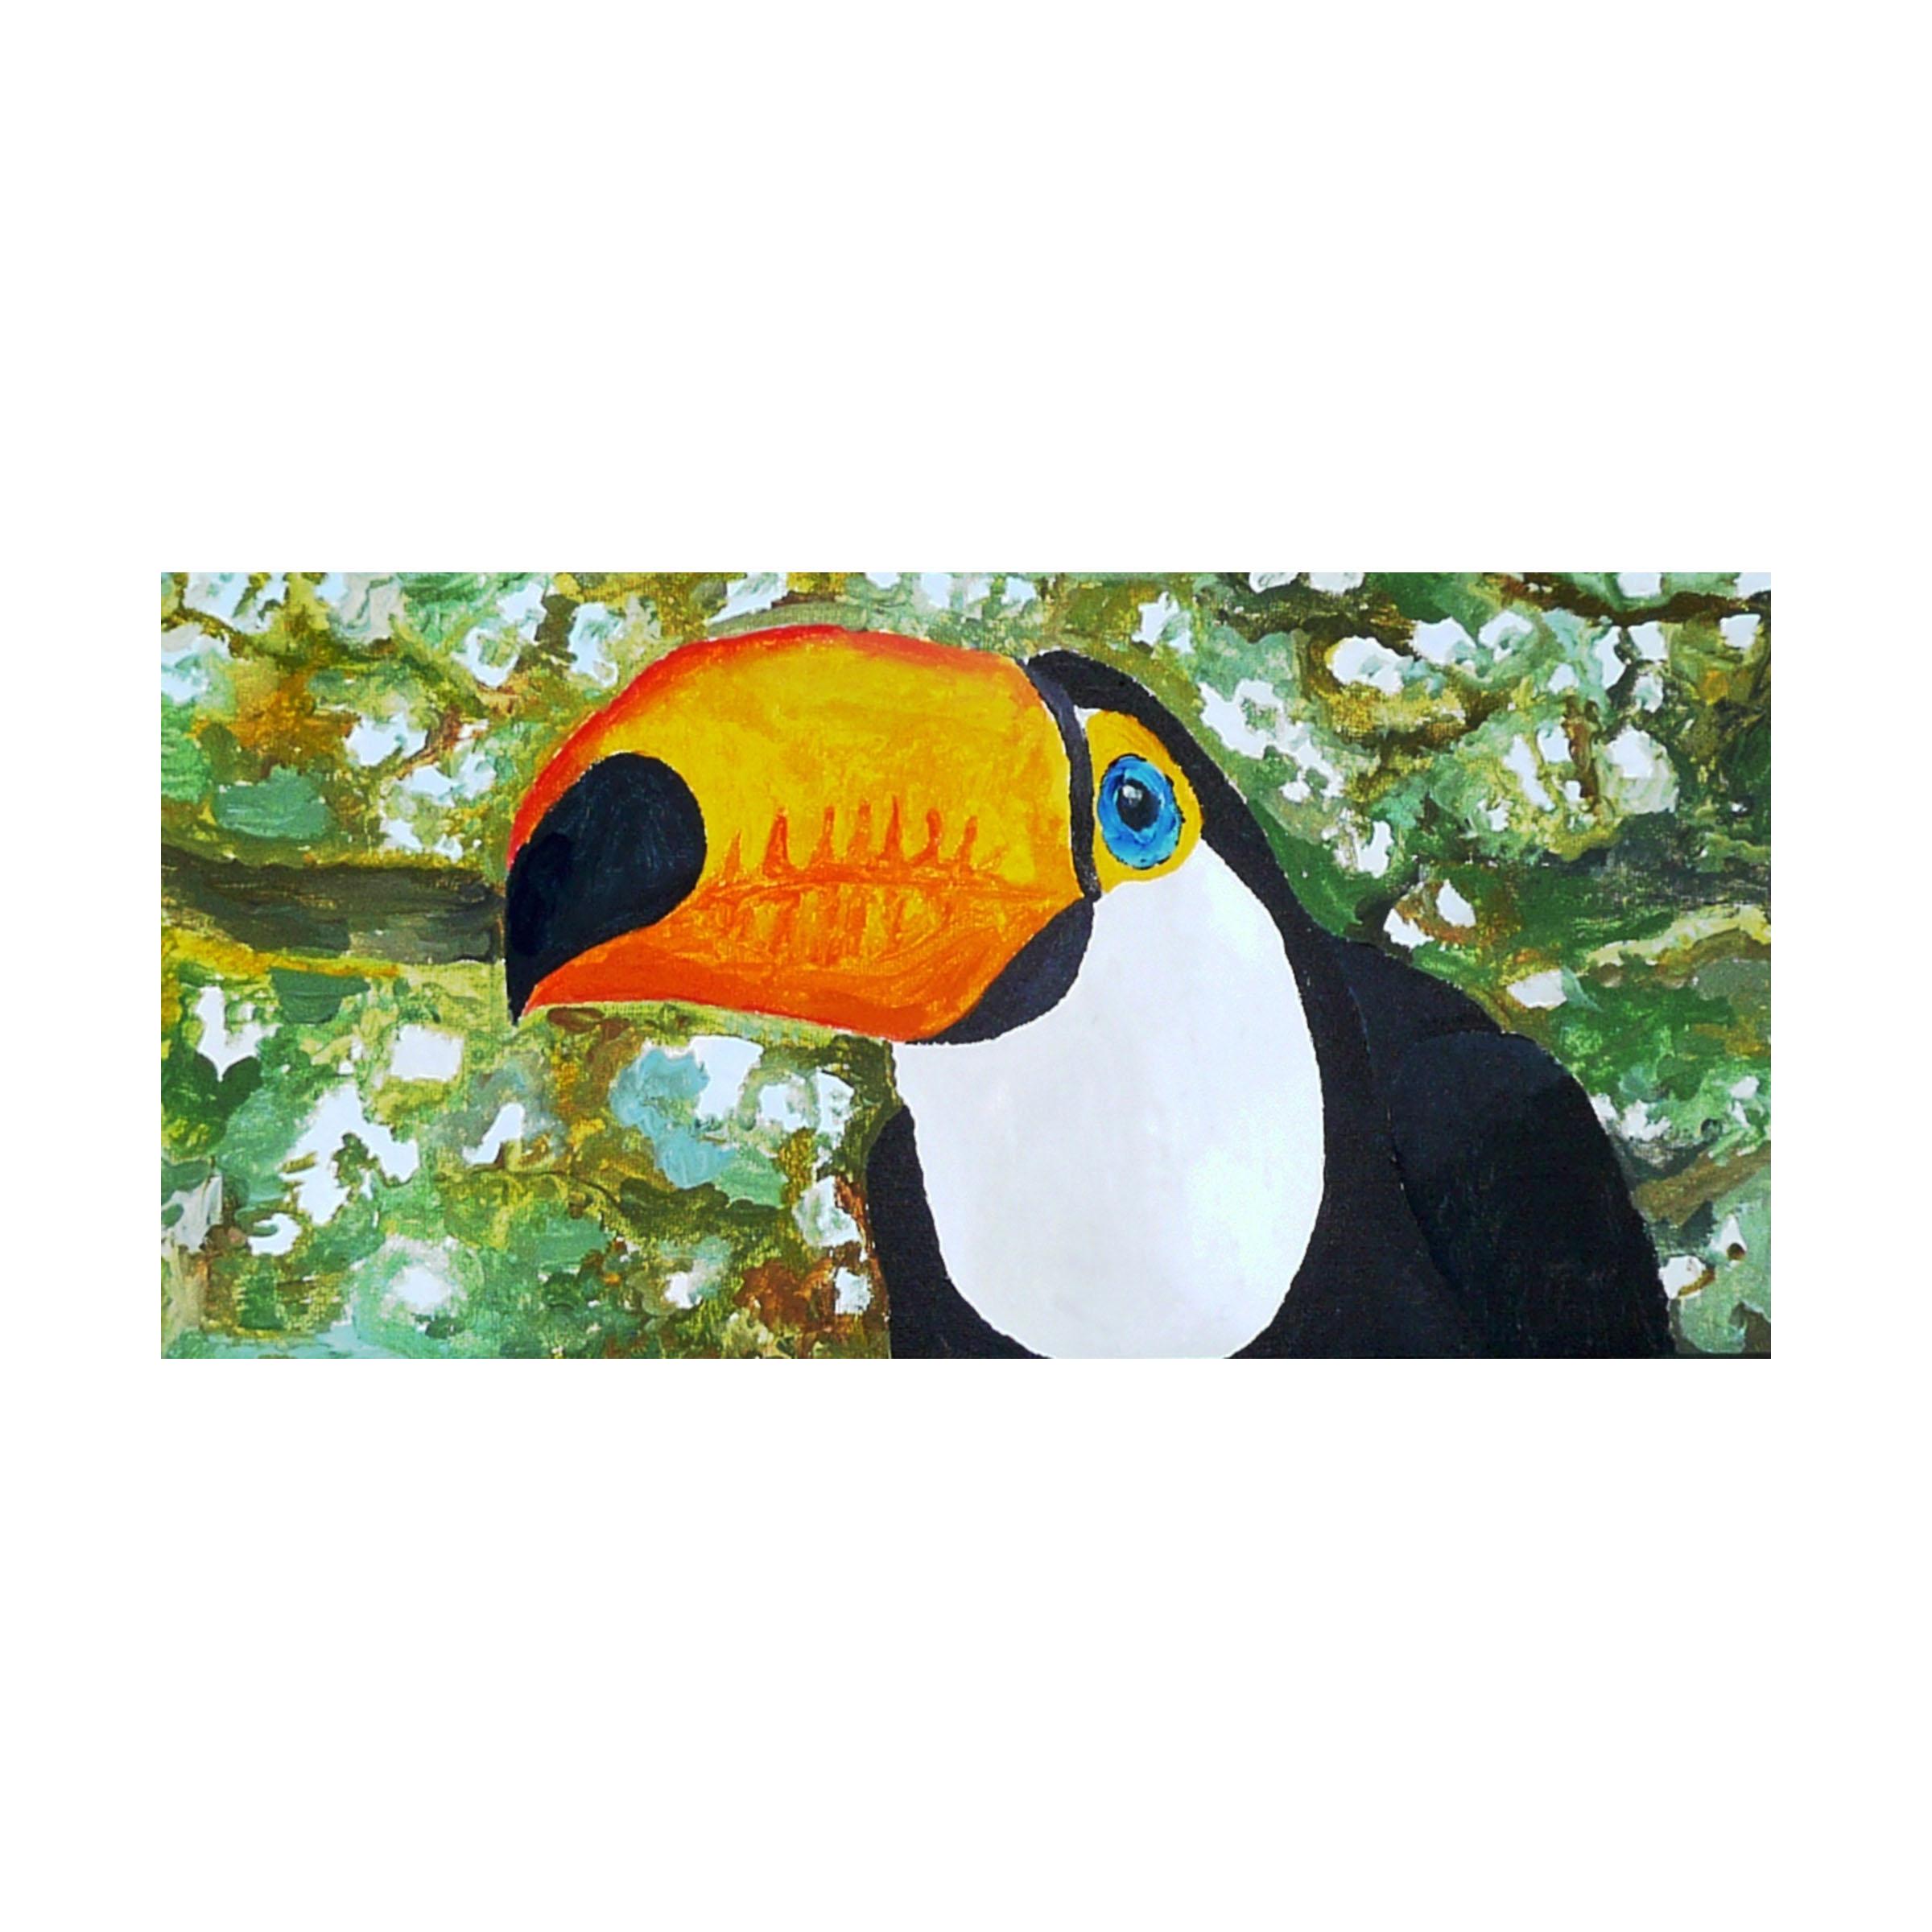 a 14 Tucan 2, acrylic on canvas panel 8'' x 16''